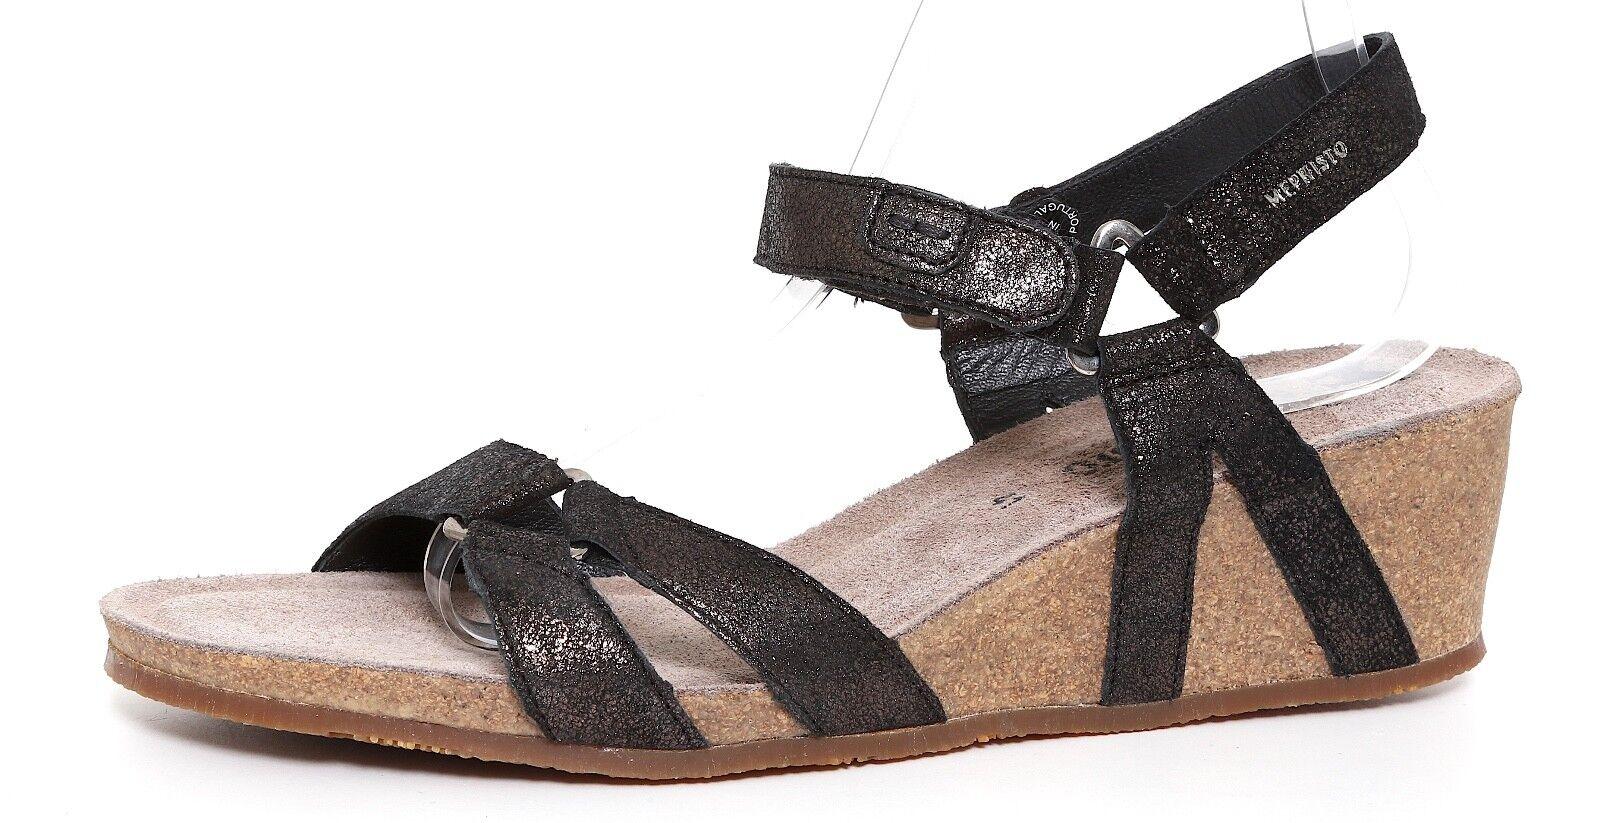 Mephisto Muguet cuarto Correa Sandalia Sandalia Sandalia de cuña negro metálico para mujeres talla 40 EUR 5210  los nuevos estilos calientes